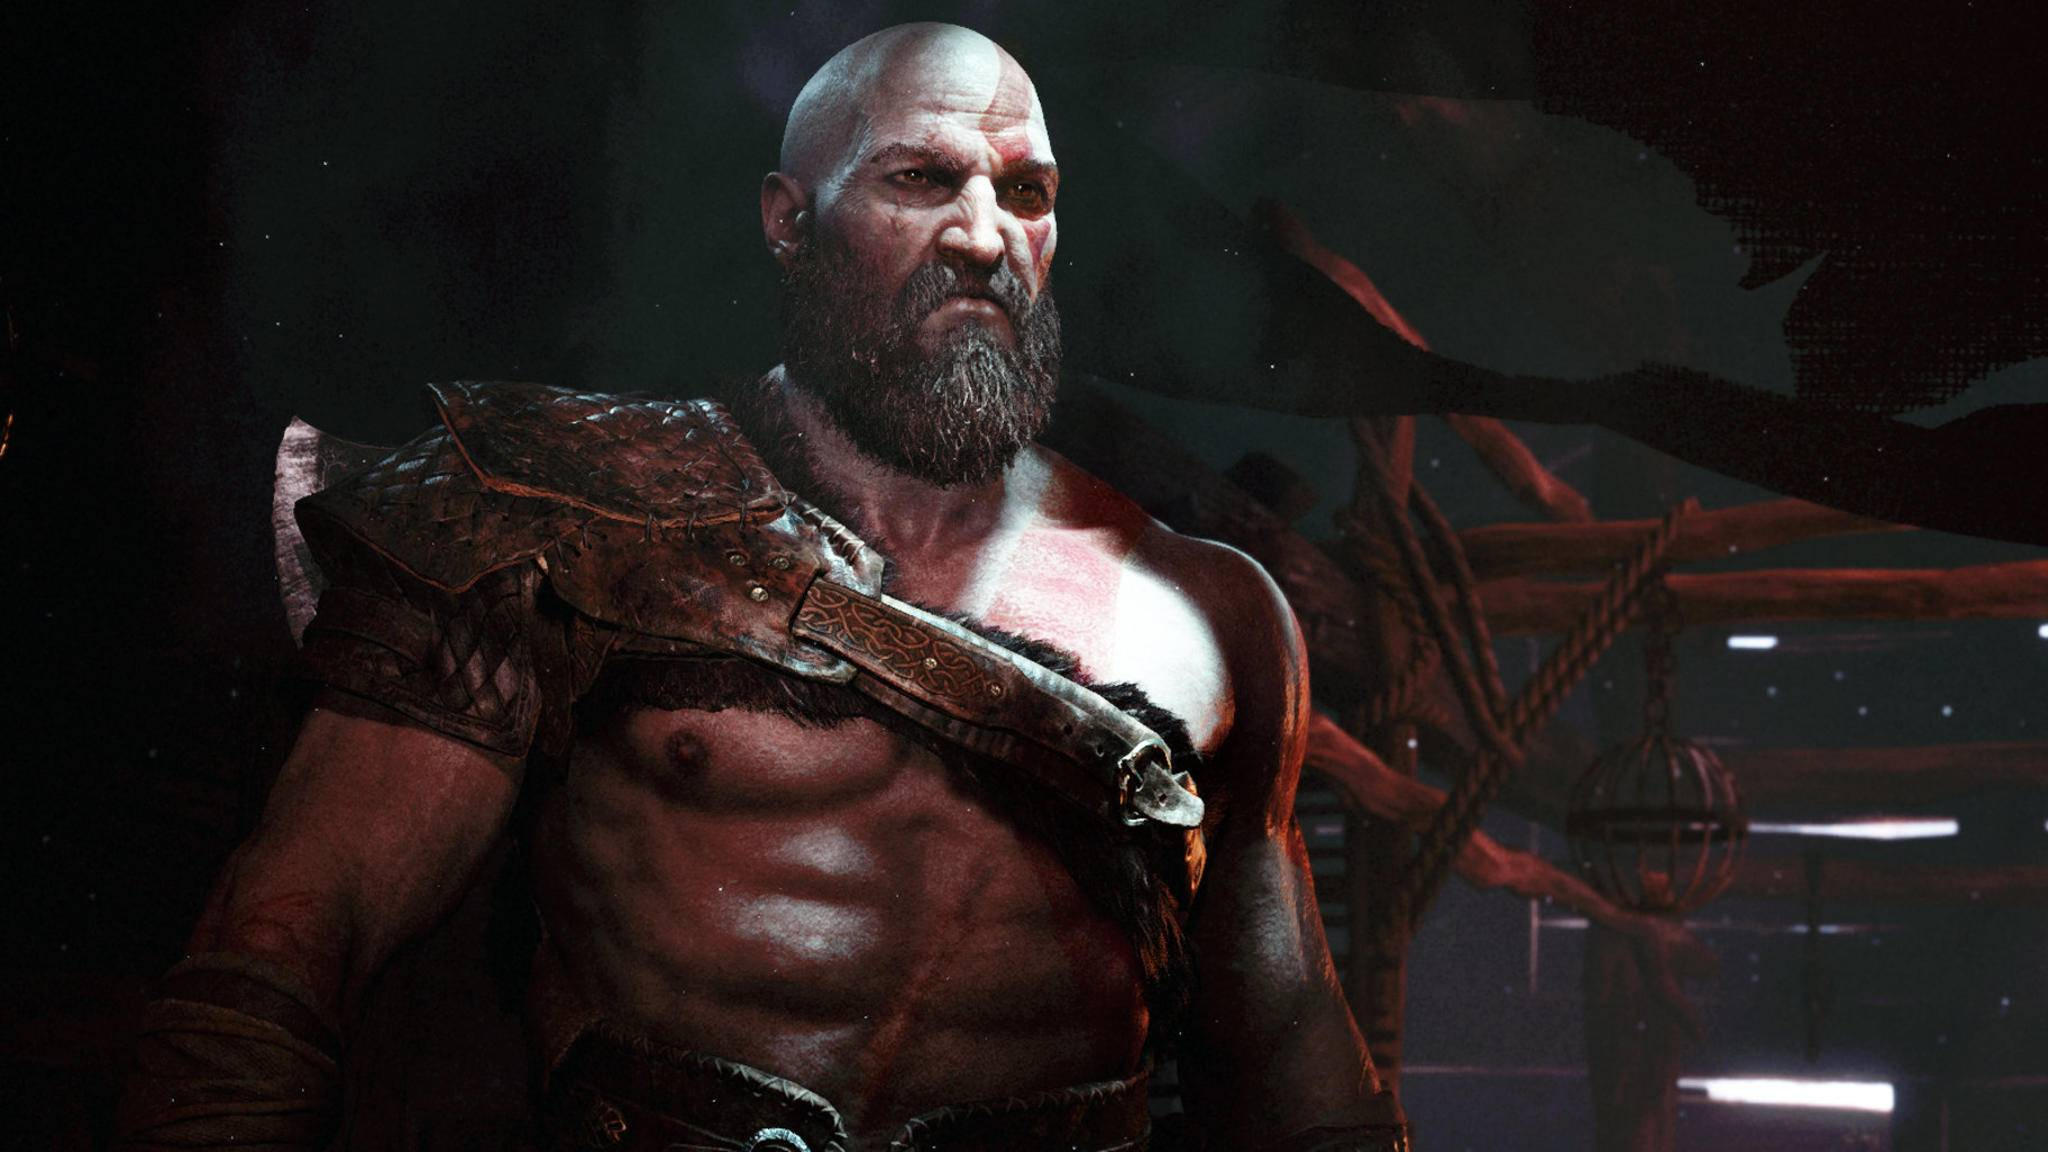 god-of-war-ps4-screenshot